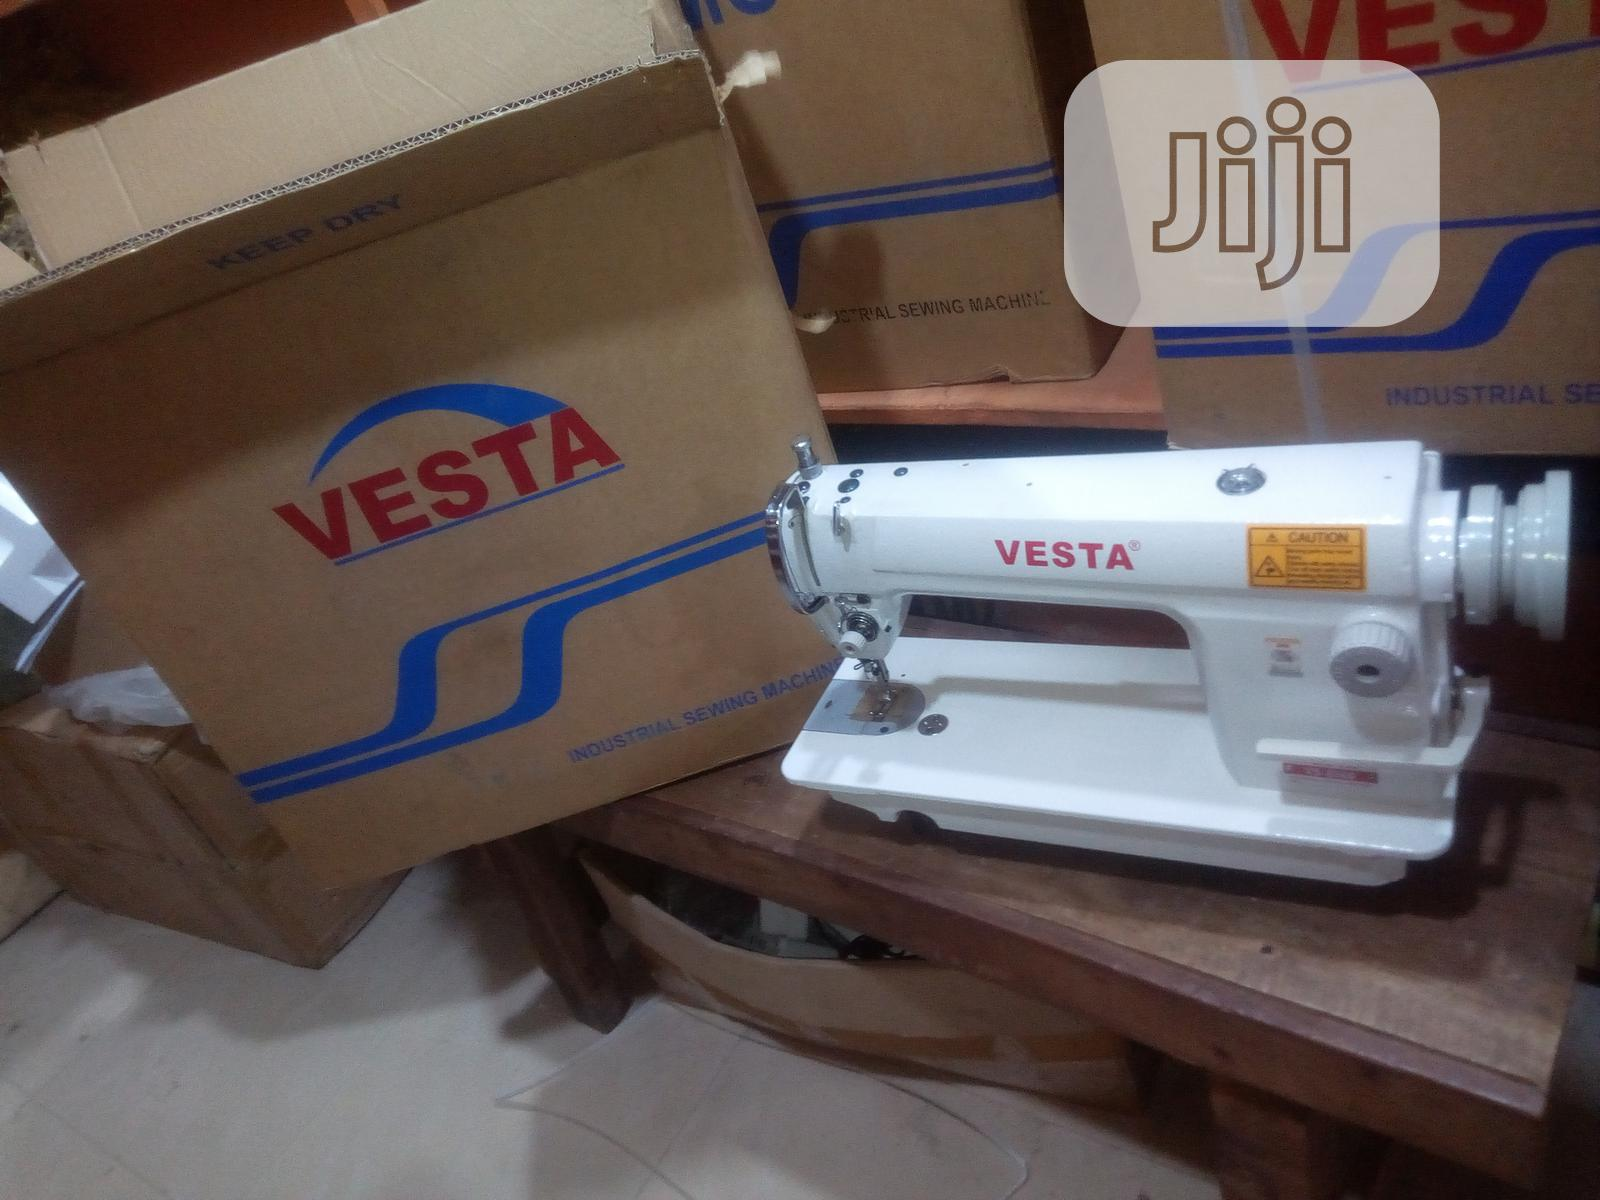 Archive: Vesta Industrial Straight Sewing Machine